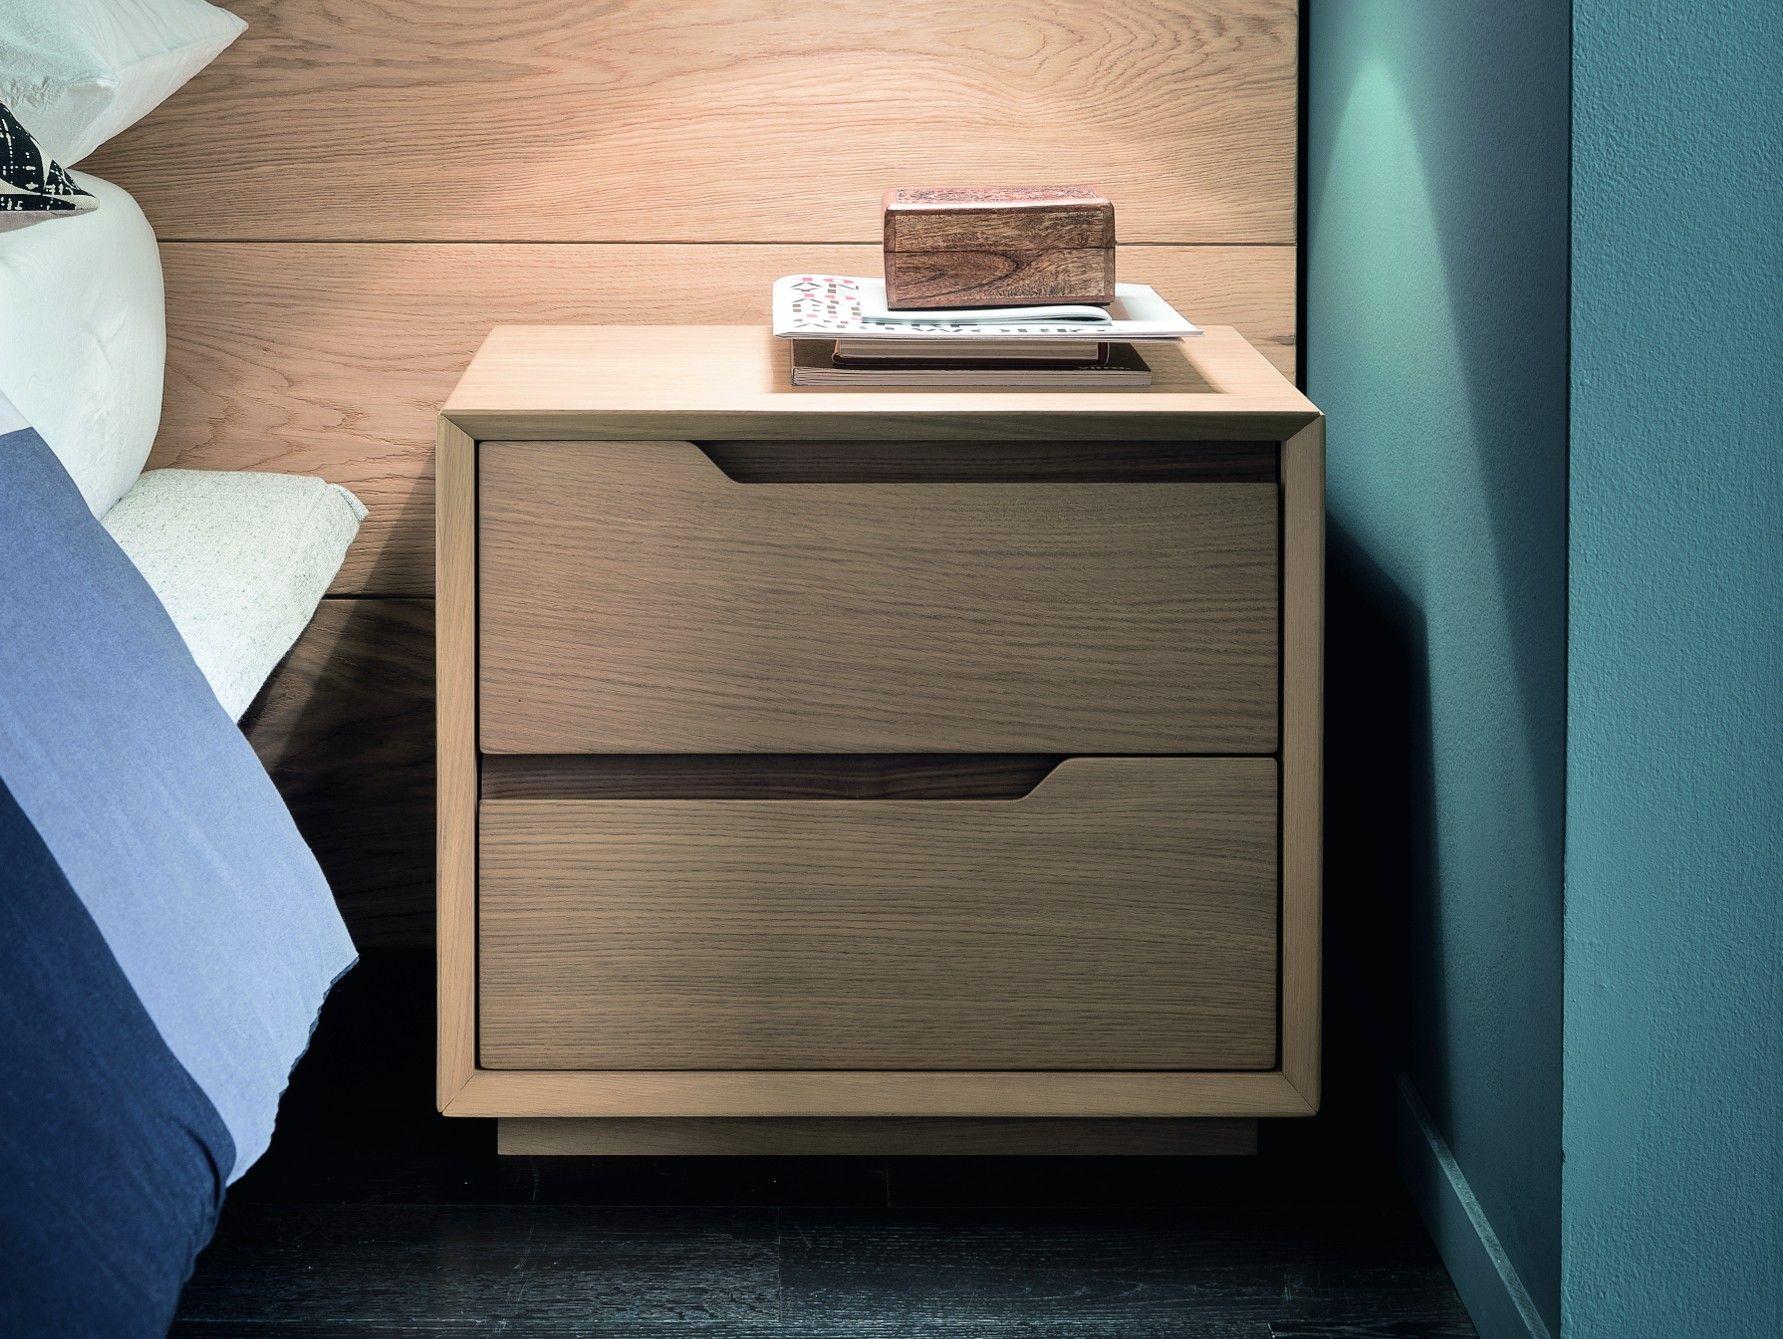 Pin By Jeslyn Lim On Bedroom Design Bedside Table Design Side Tables Bedroom Furniture Bedside Table